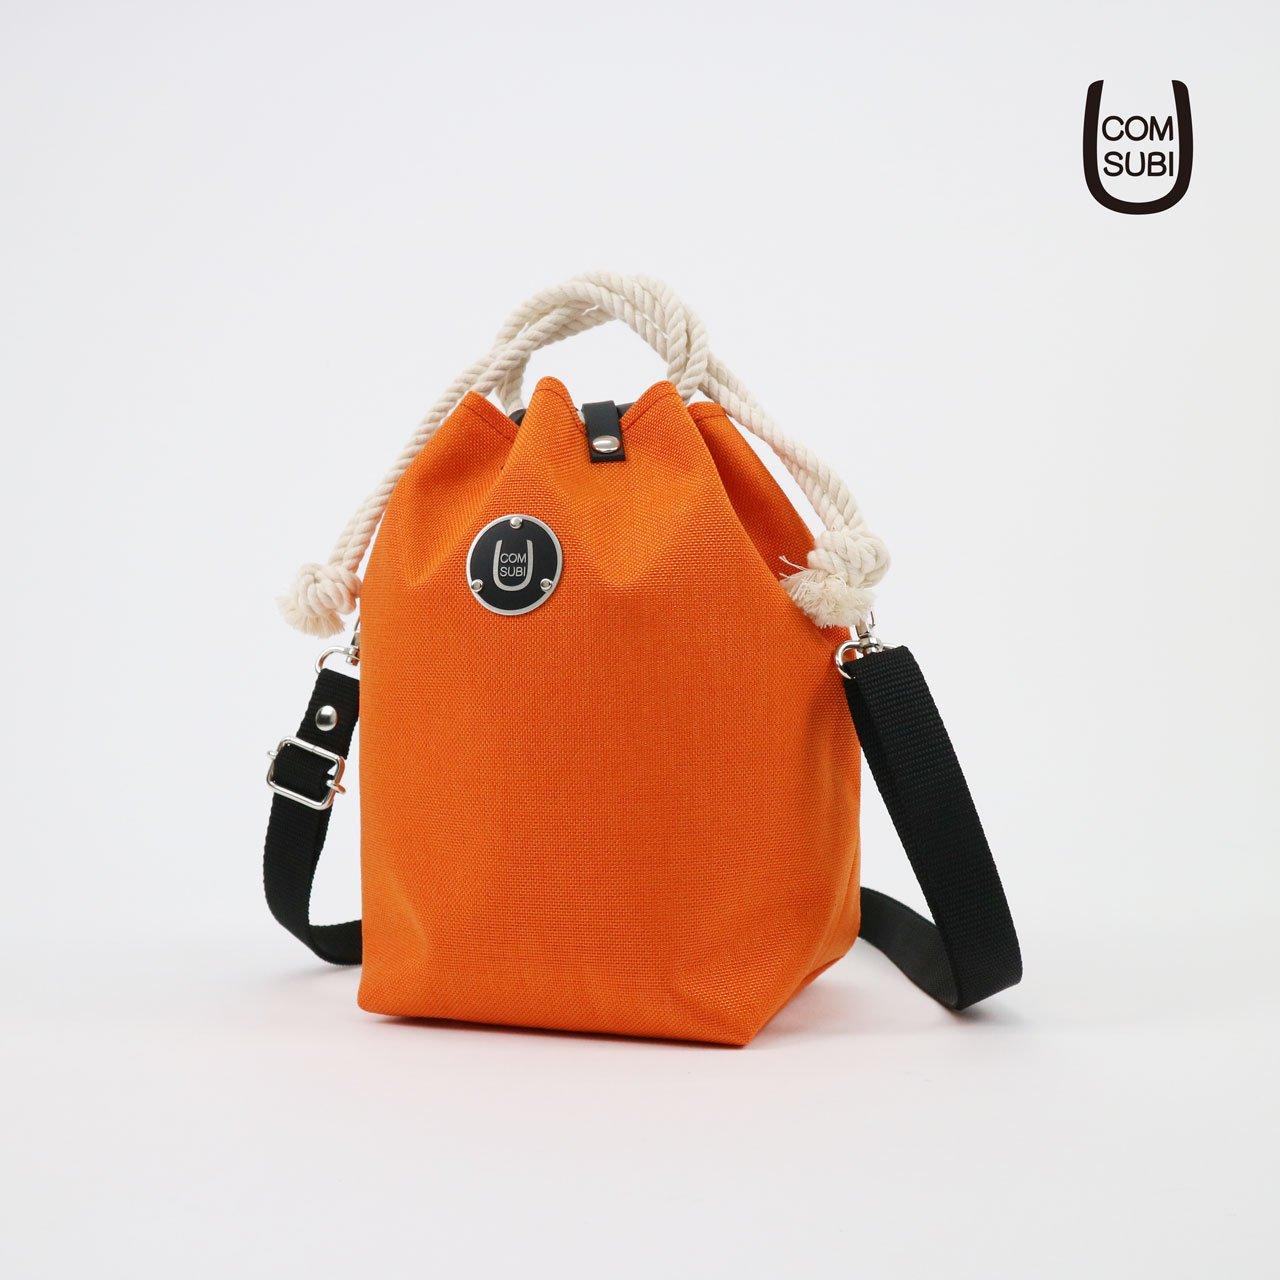 "COMUSUBI BAG  ""Cordura®"" -Orange-"